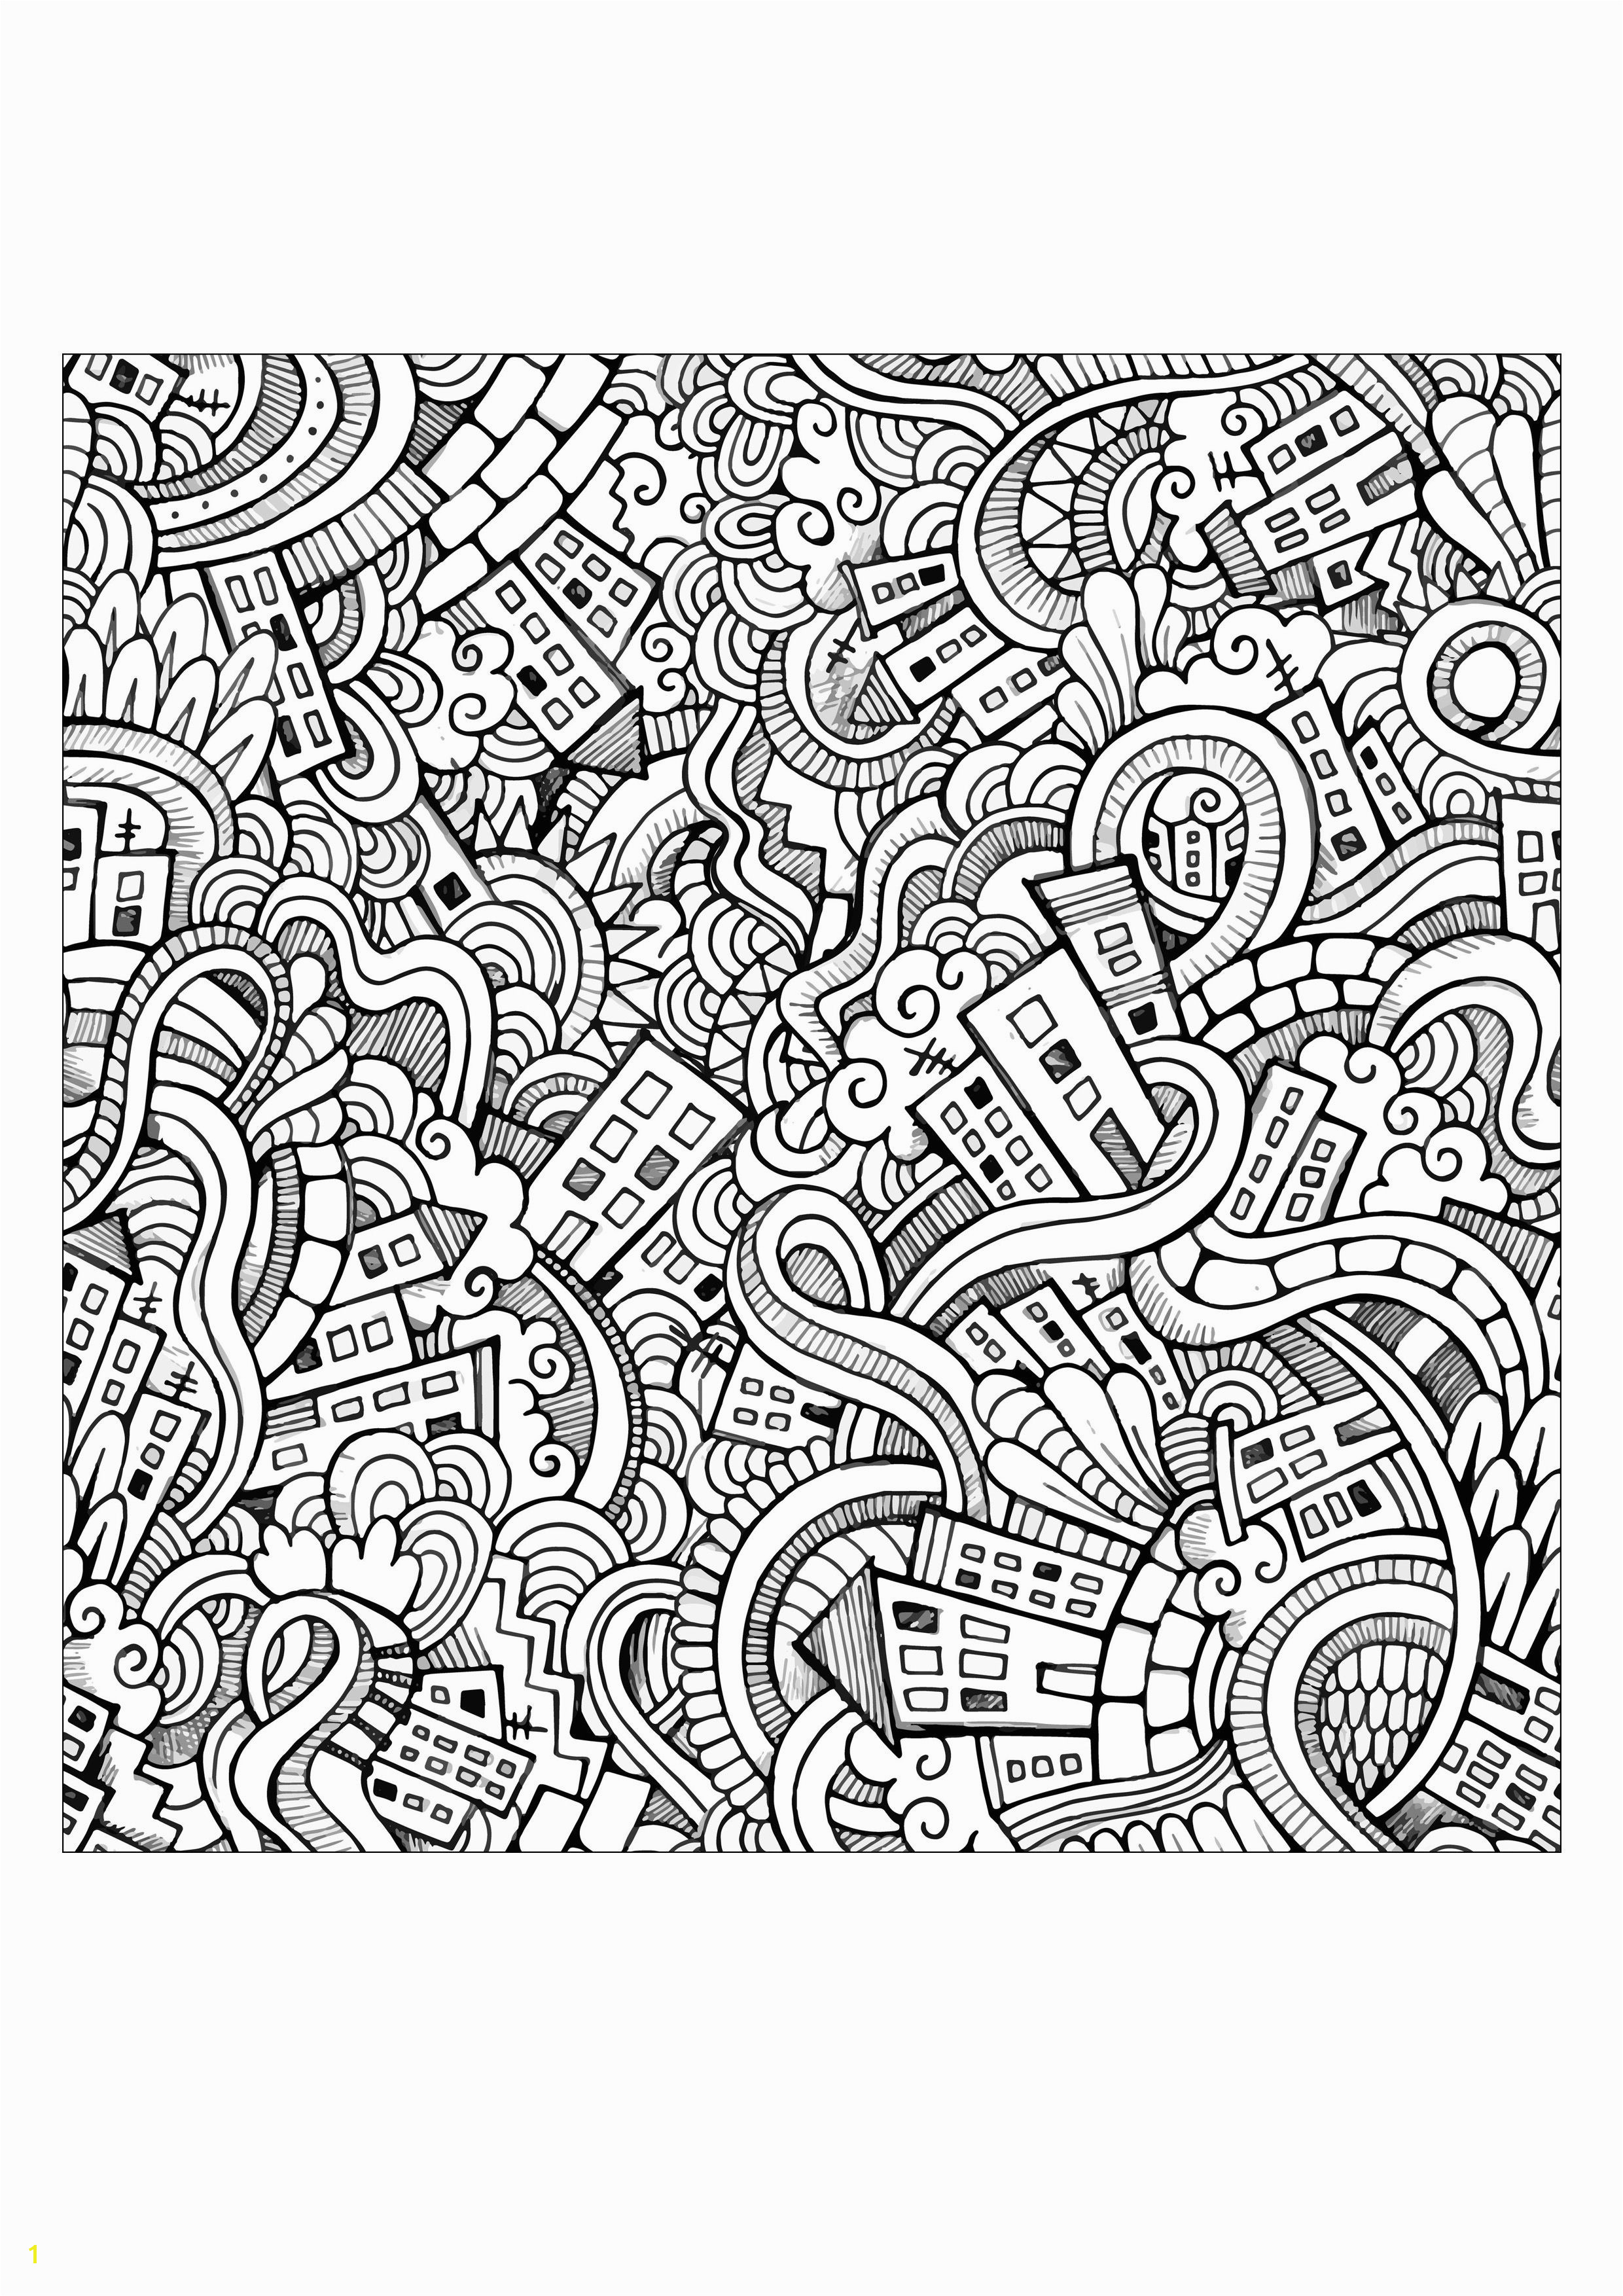 Weird doodle city by Olga Kotsenko Source 123rf From the gallery Doodling Doodle Art Artist Olga Kotsenko Source 123rf